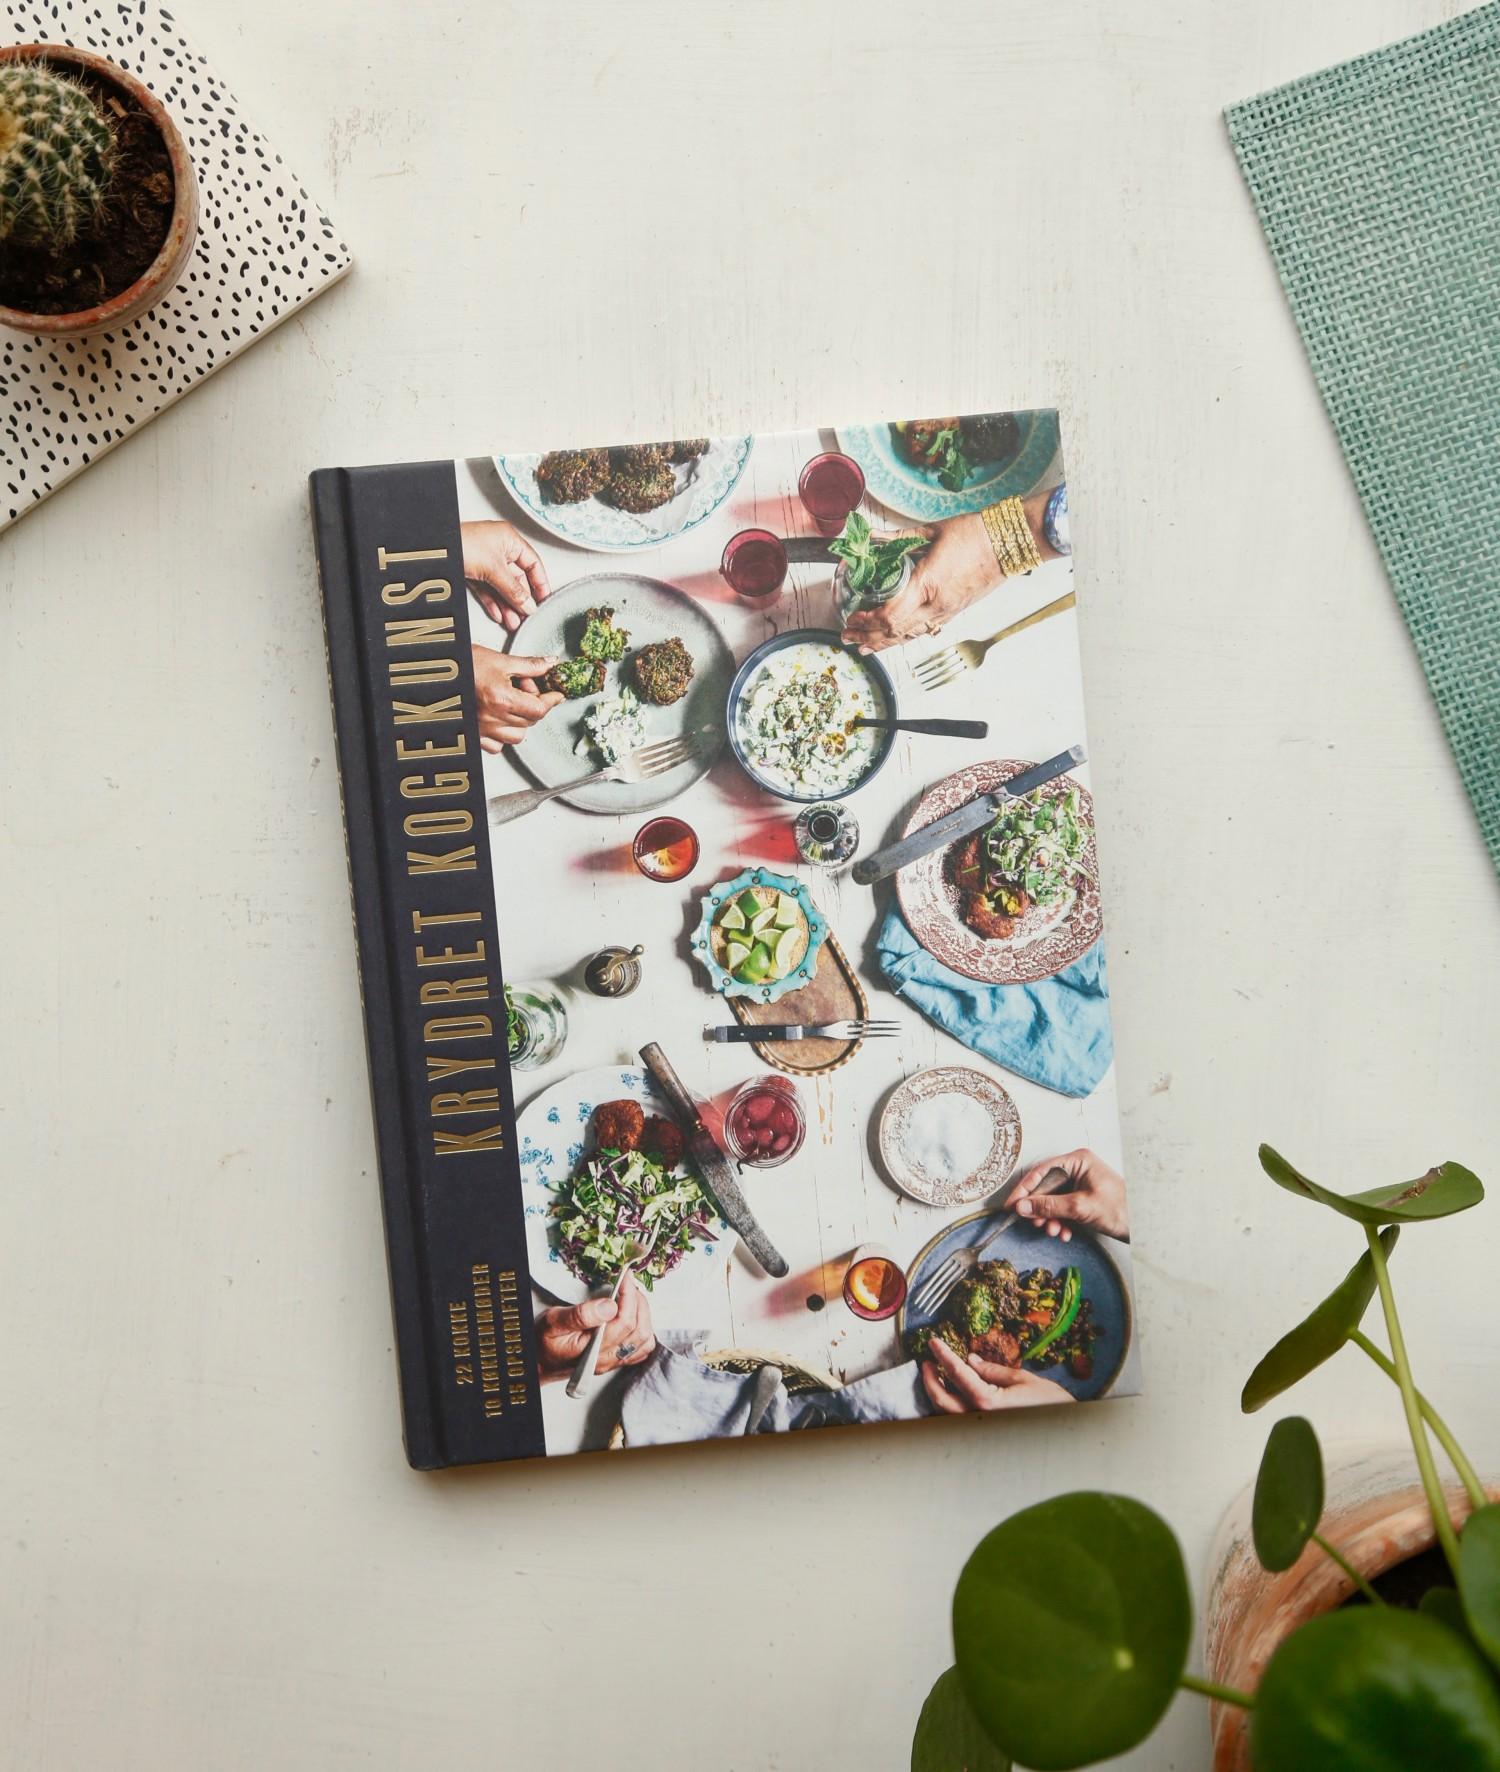 krydret-kogekunst-muusmann-forlag-send-flere-krydderier-1